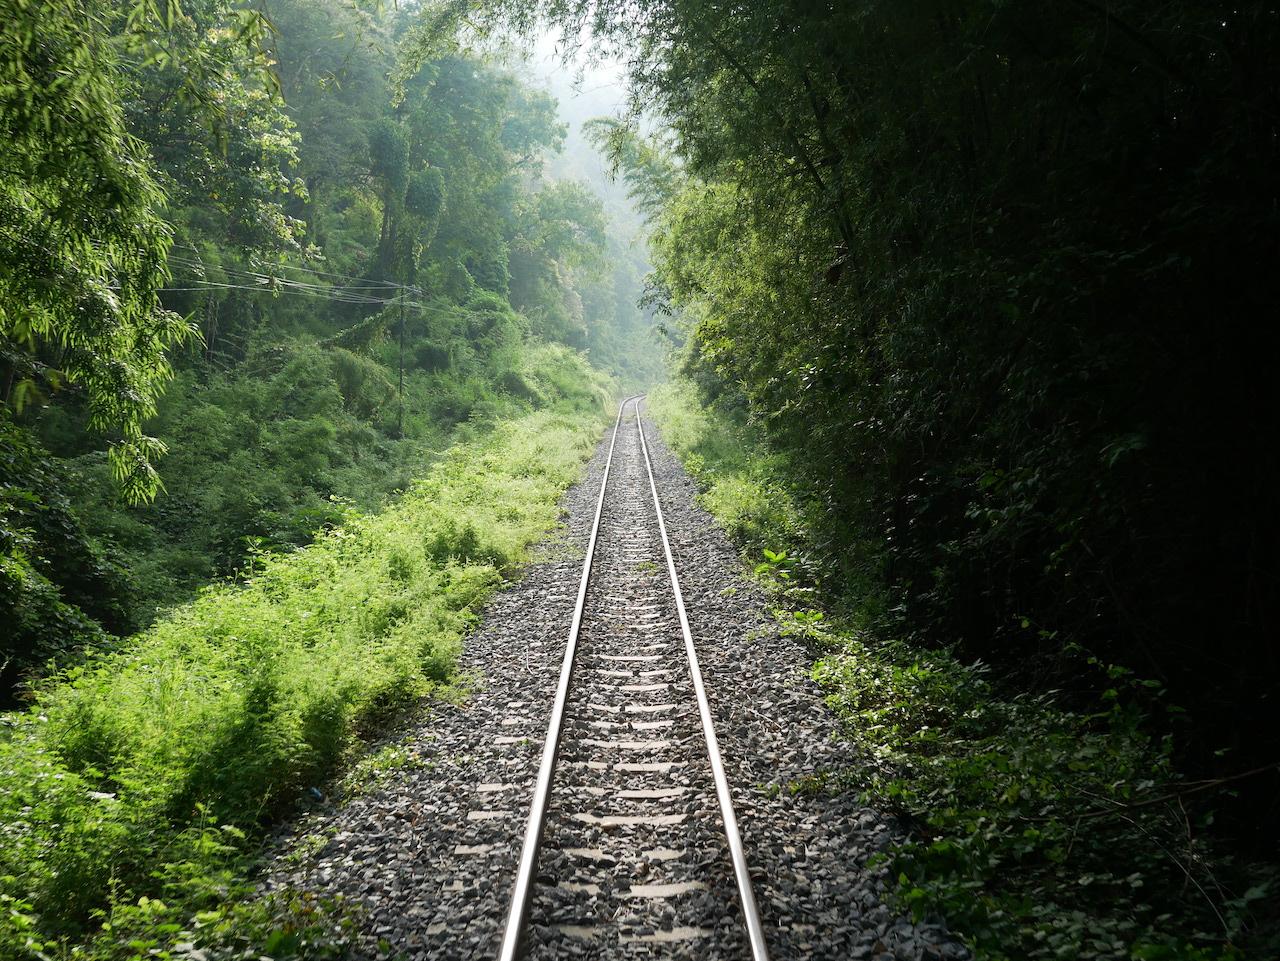 Thaïlande #11 : Kanchanaburi & les chutes d'Erawan